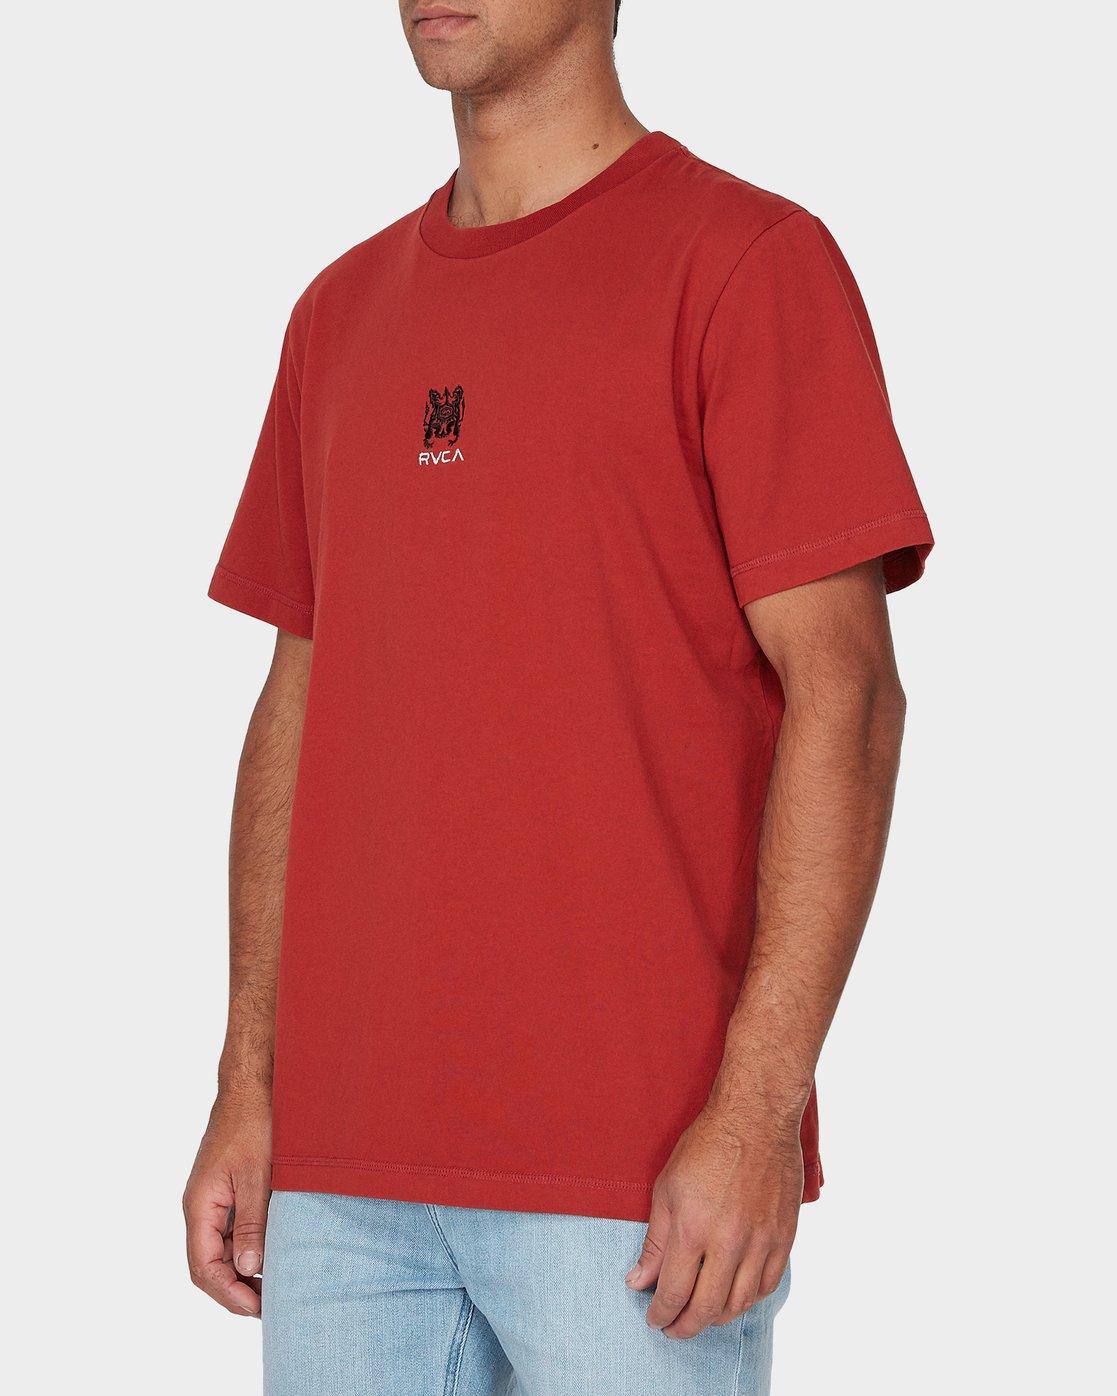 1 RVCA Crest Short Sleeve T-Shirt  R193055 RVCA